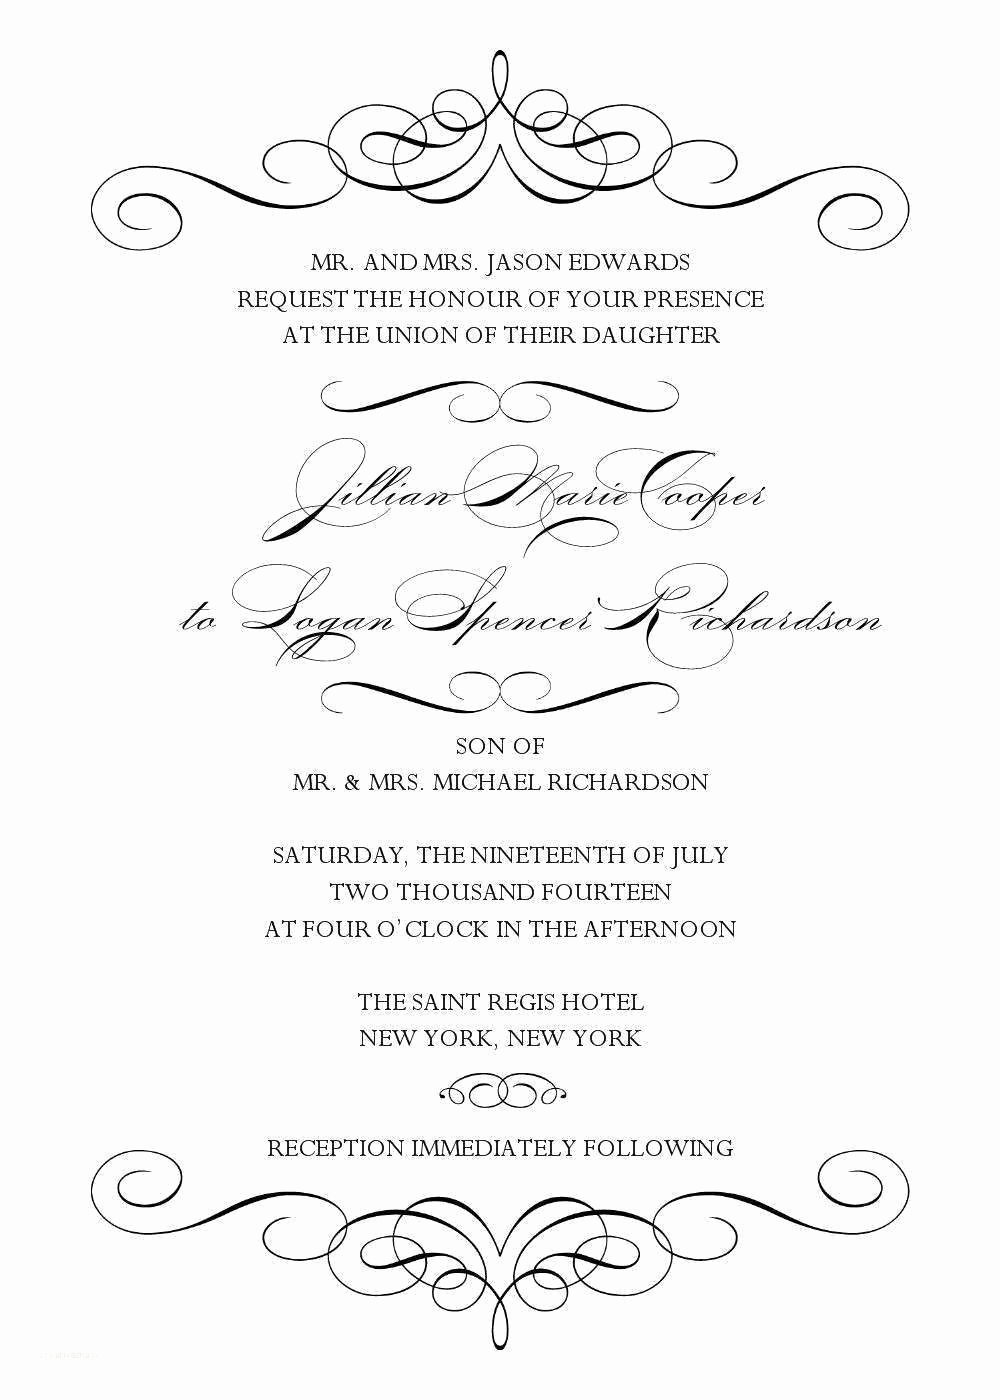 Blank Wedding Invitation Templates for Microsoft Word